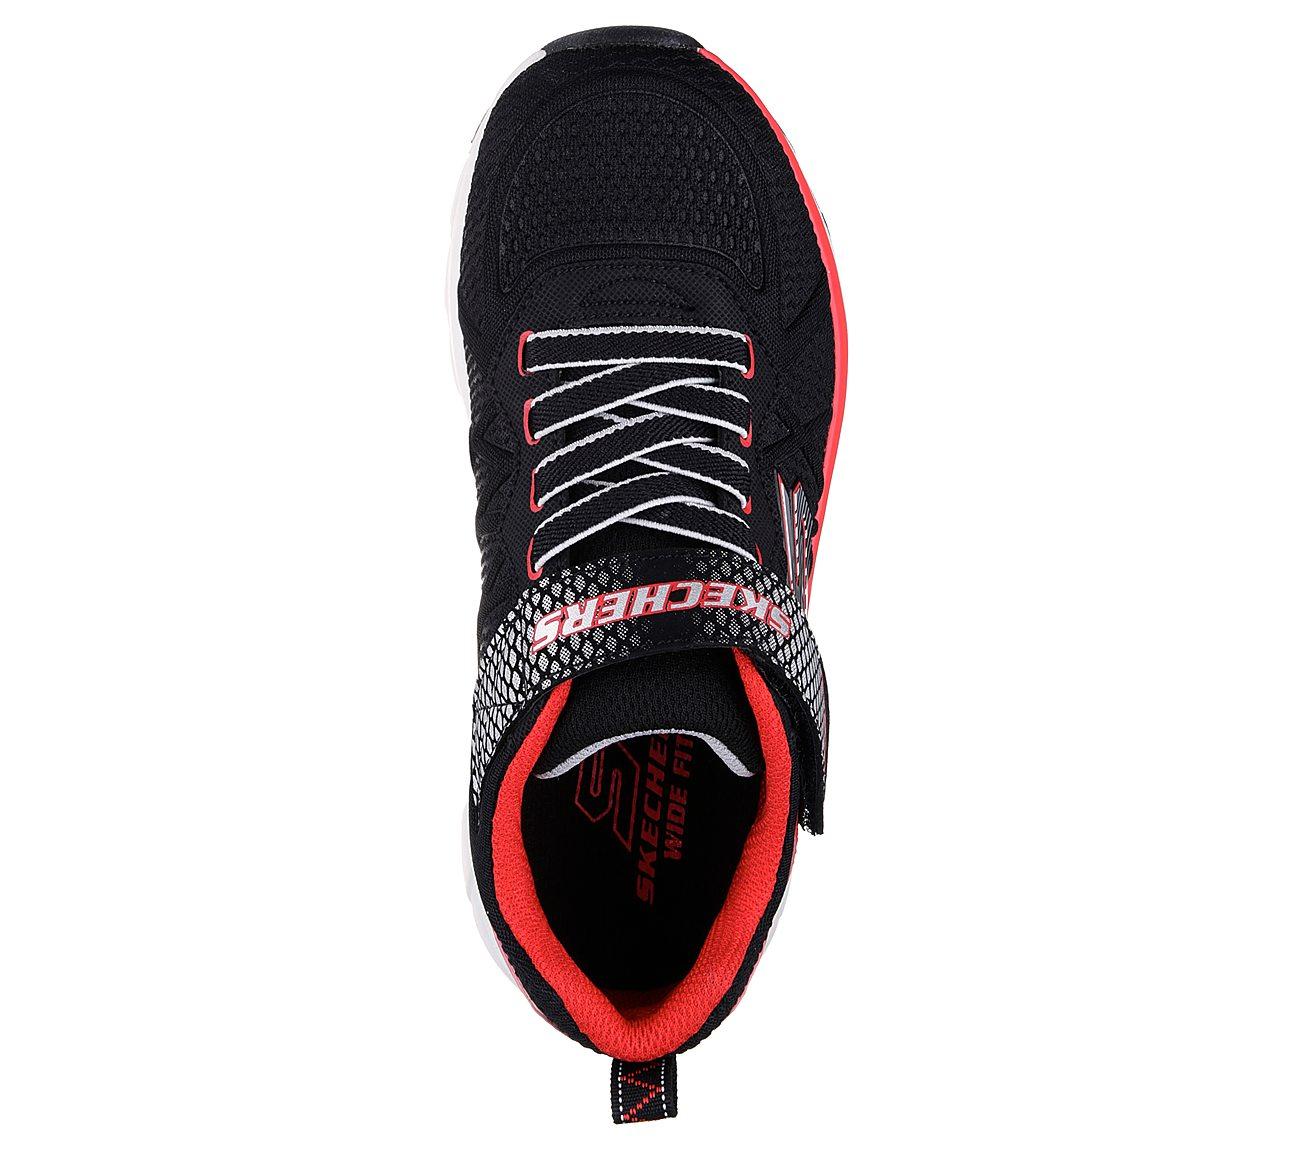 Details about Skechers Boys Sports Trainers Ultrasonix 97541